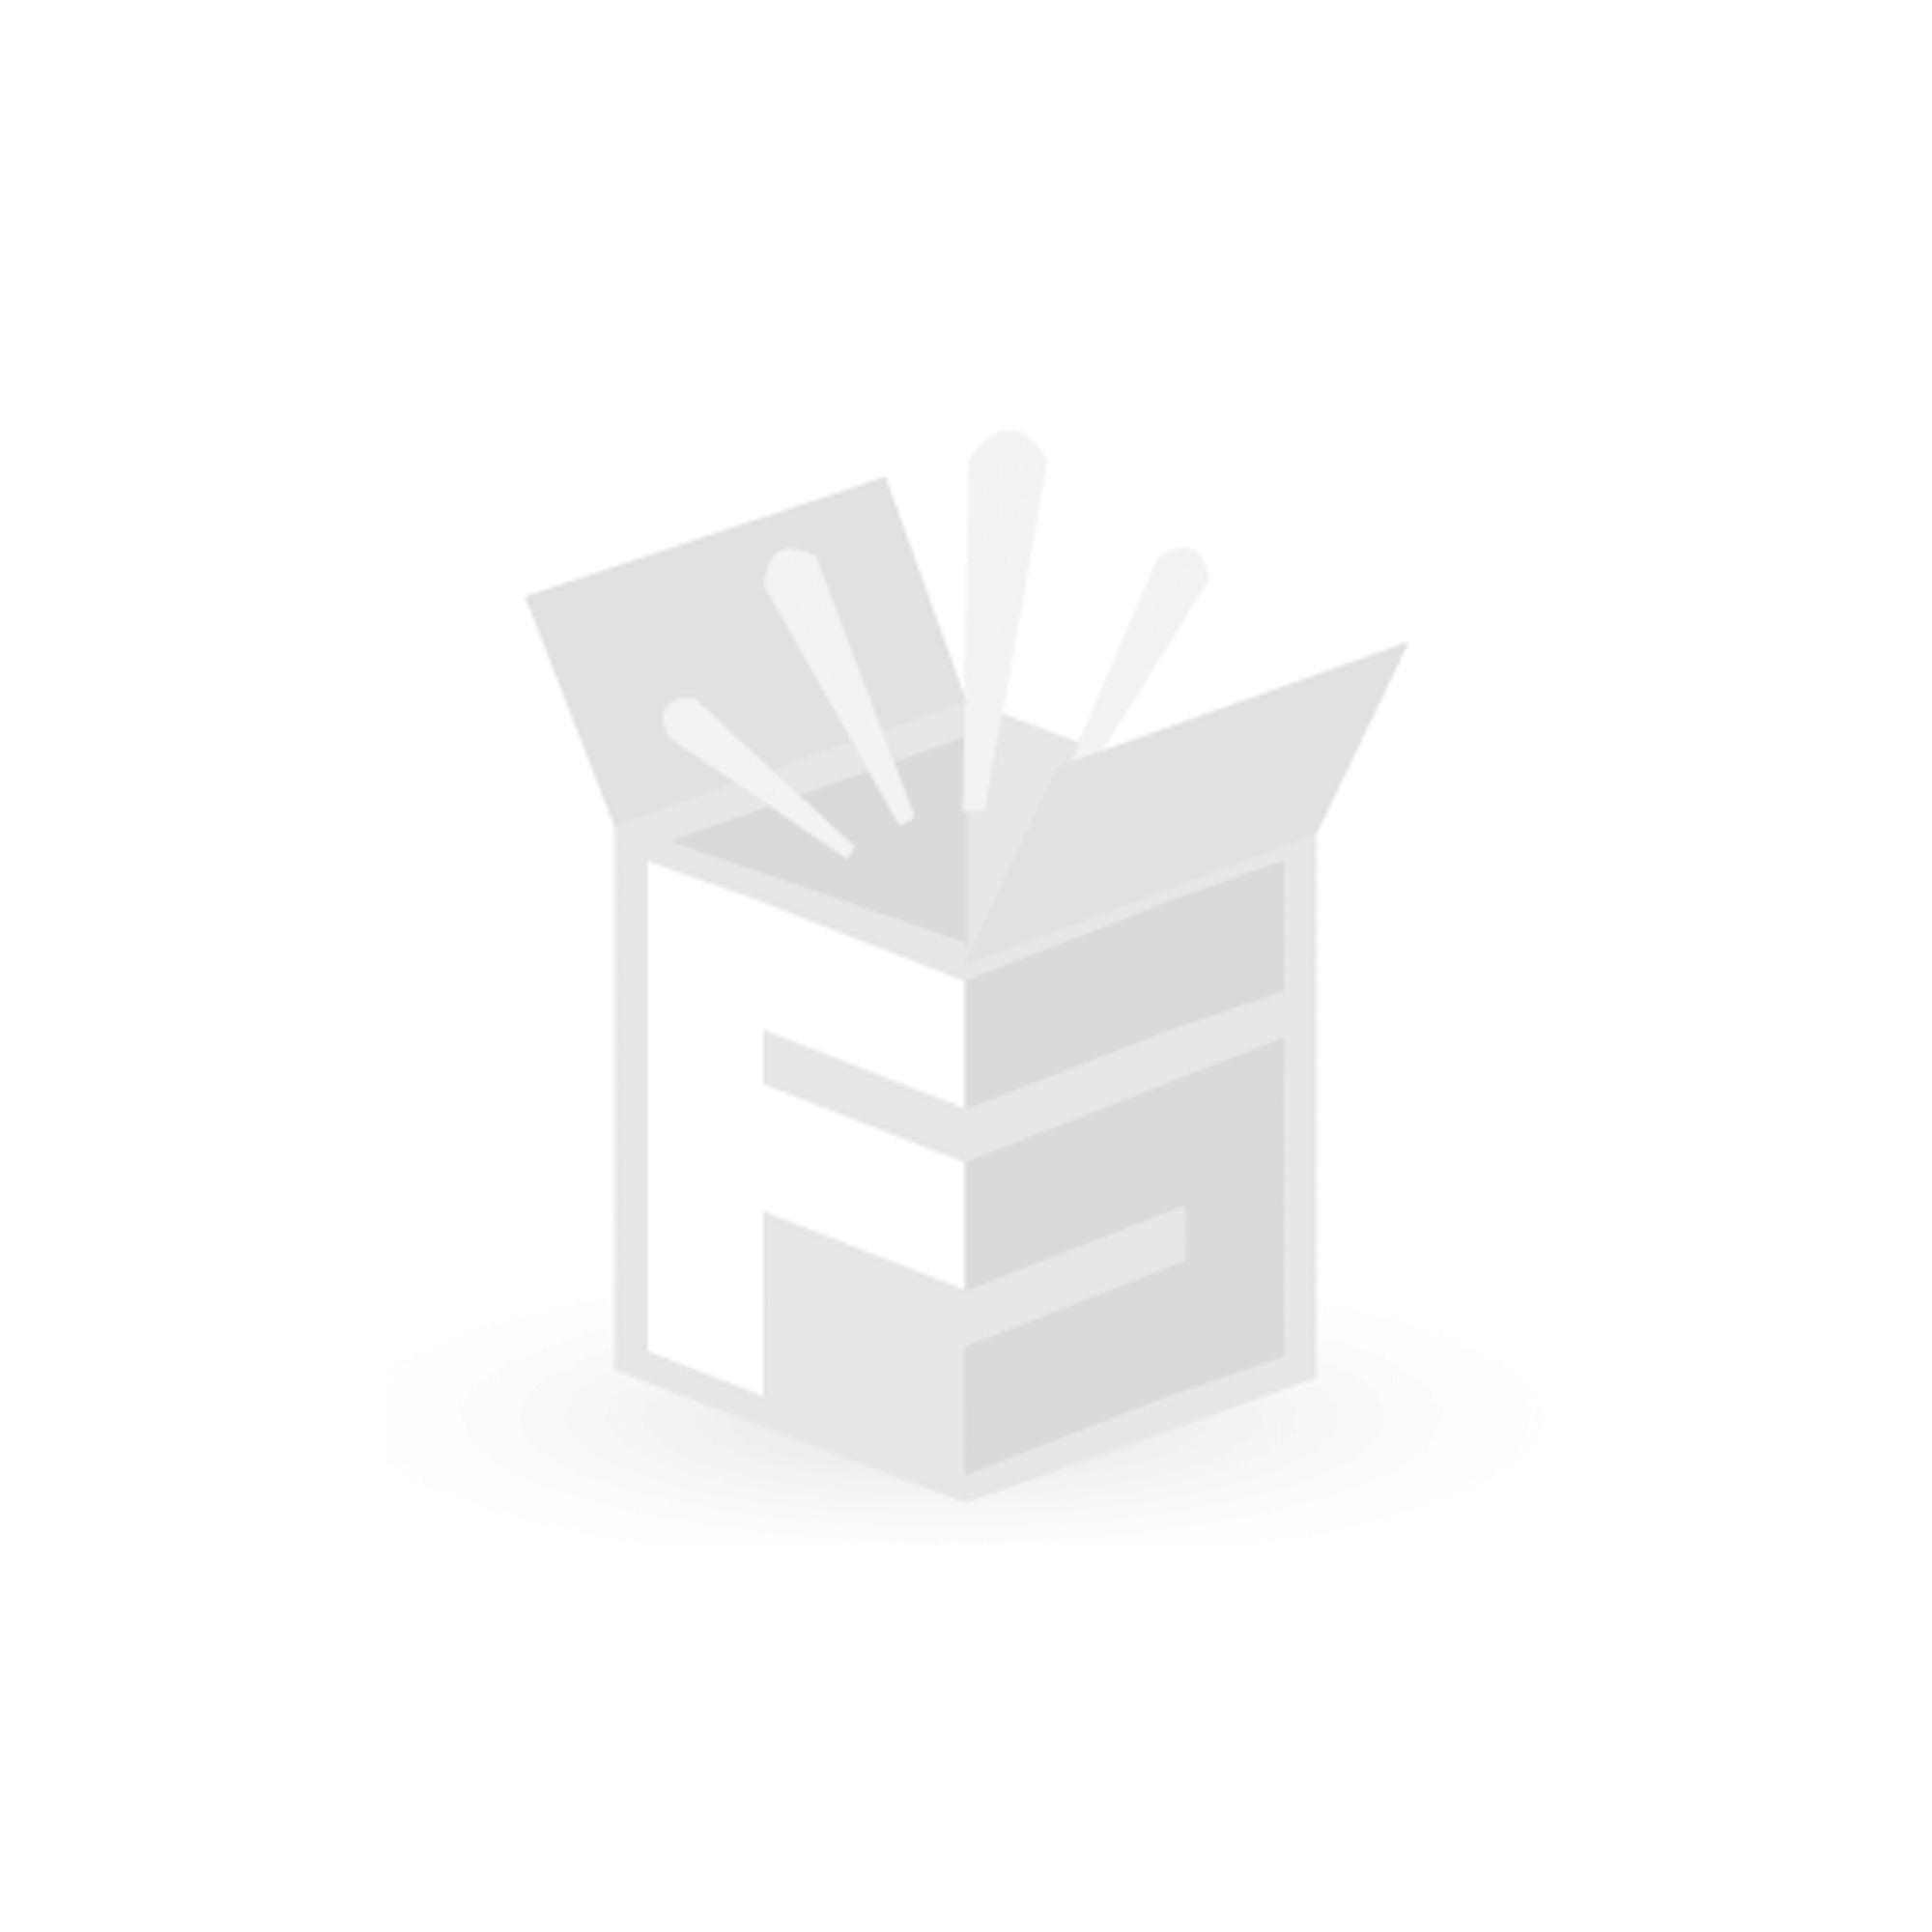 Bosch Säbelsägeblatt-Set für Holz und Metall, 20 Stück